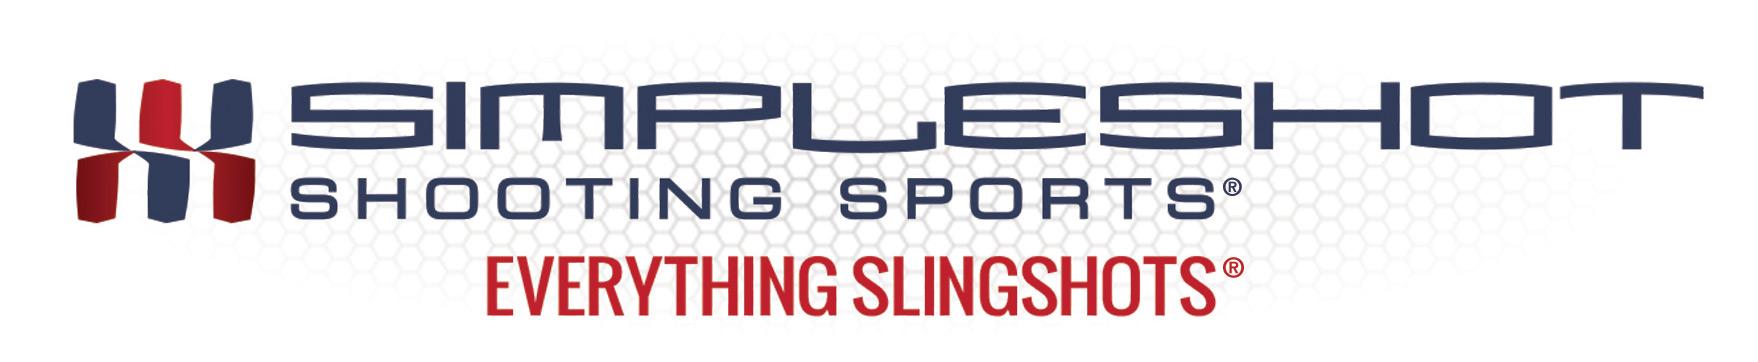 SimpleShot Shooting Sports. Everything Slingshots.